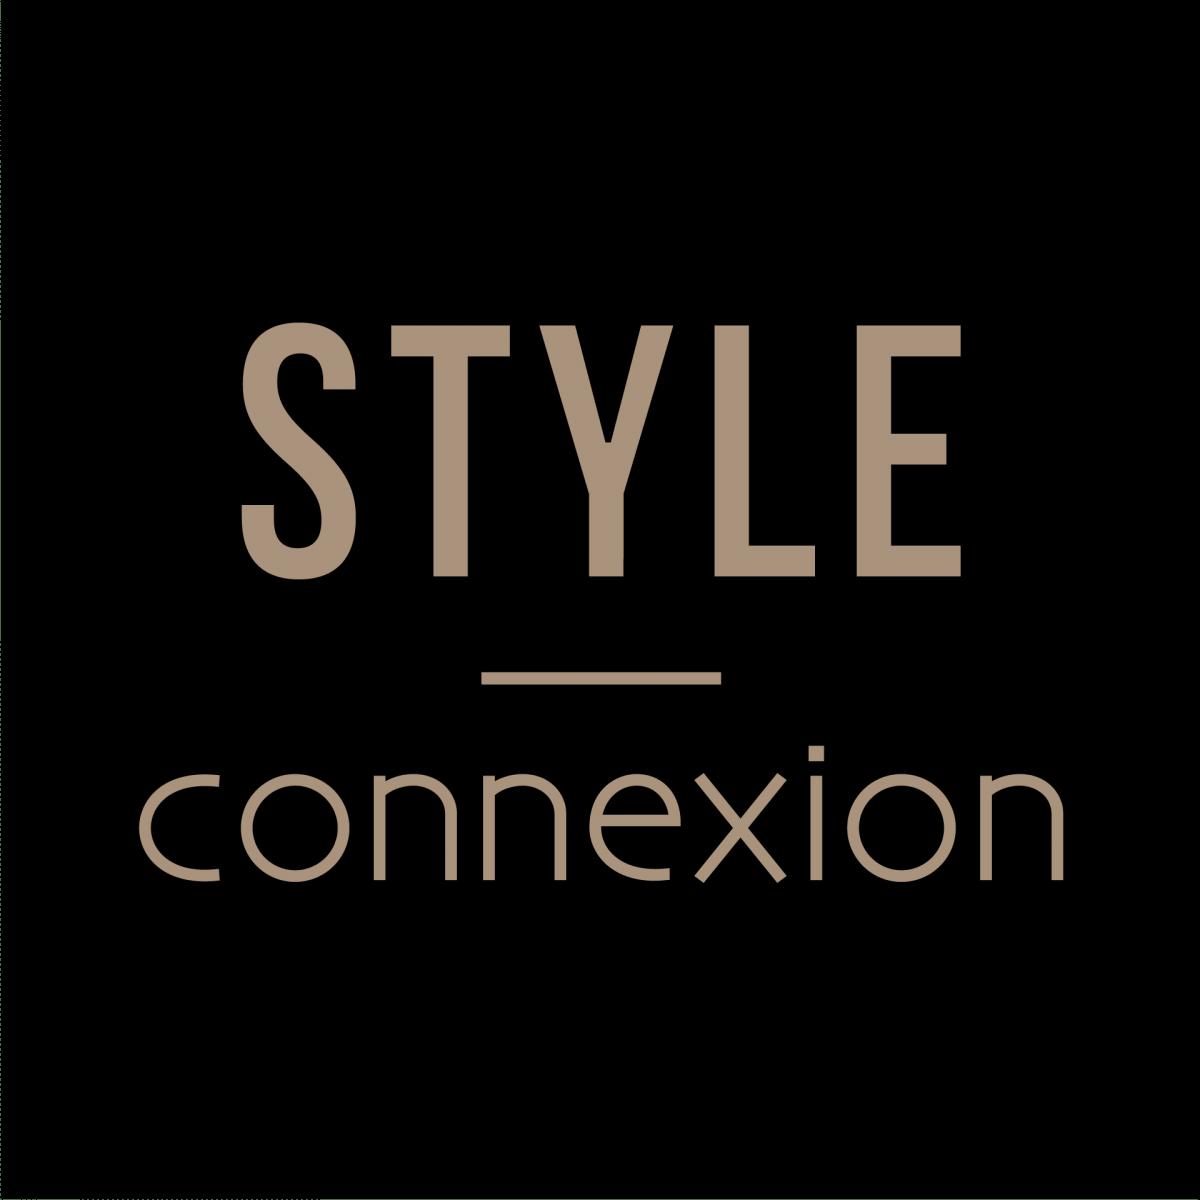 Styleconnexion